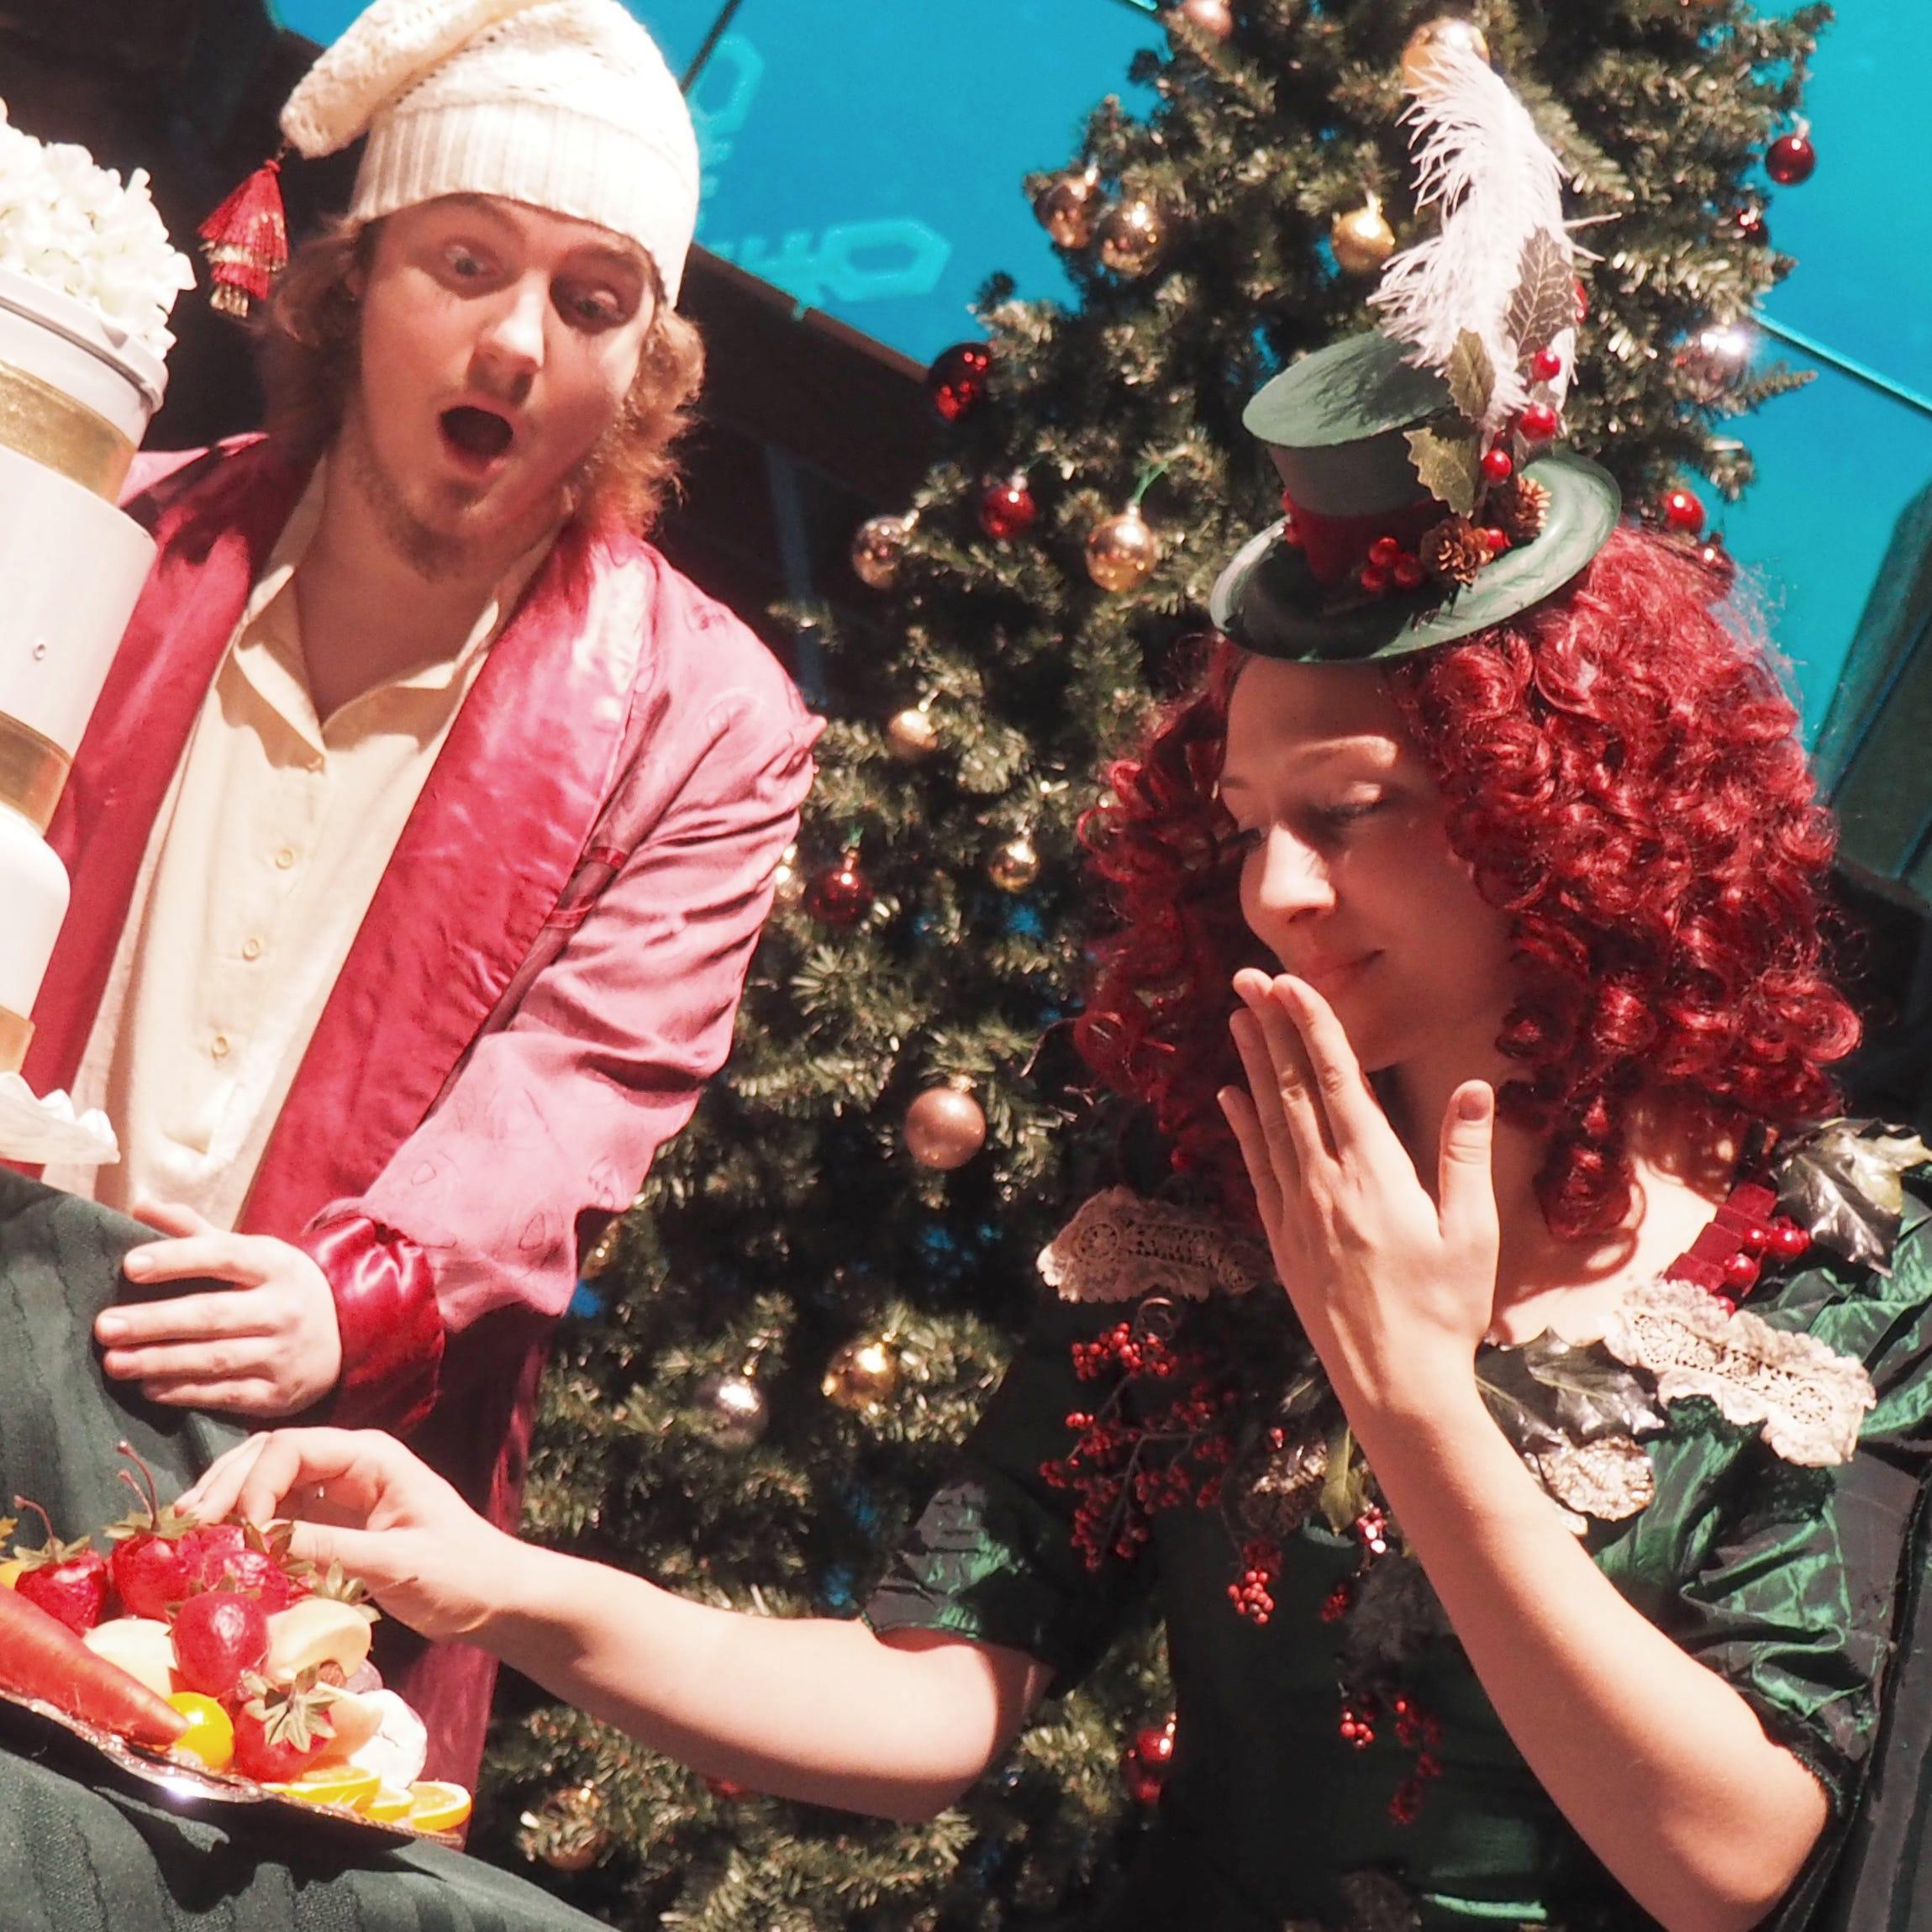 More than 100 Fond du Lac high school students to present 'A Christmas Carol' Nov. 1 to 4